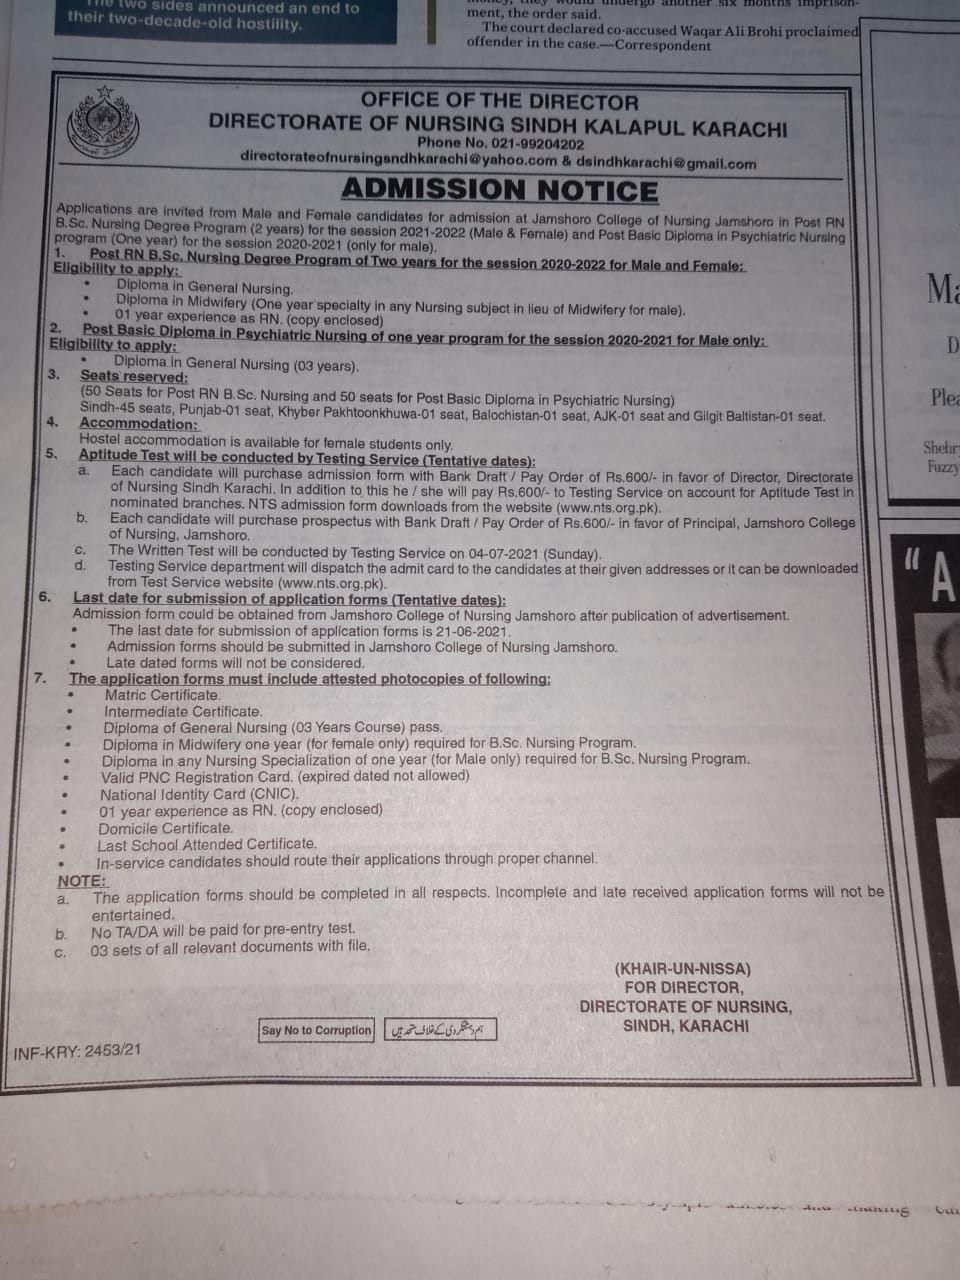 Sindh Directorate of Nursing Admission RN BS Nursing Program NTS Slip